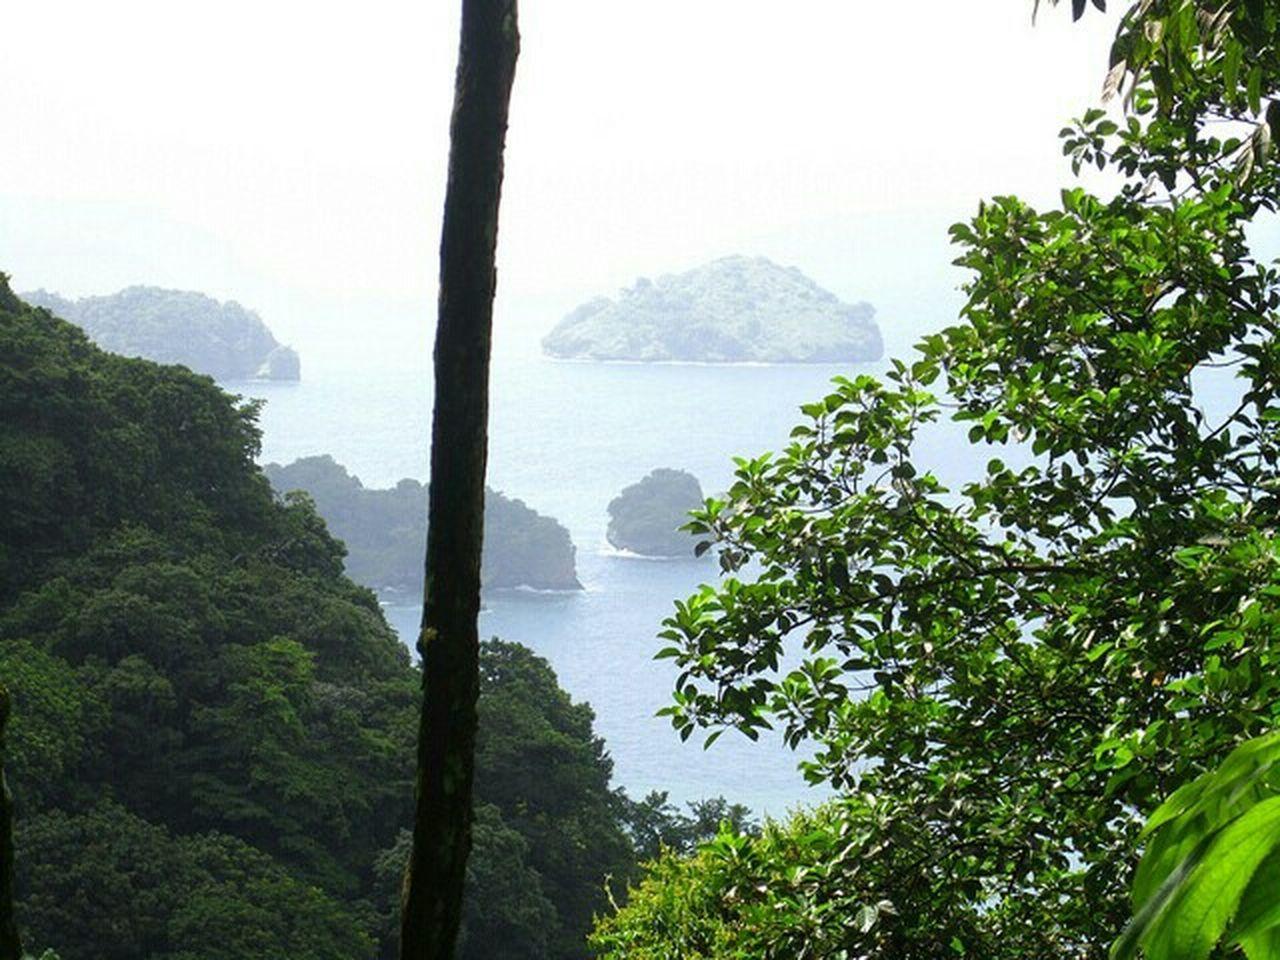 Trinidad And Tobago Rainforest Jungle Island Island Life